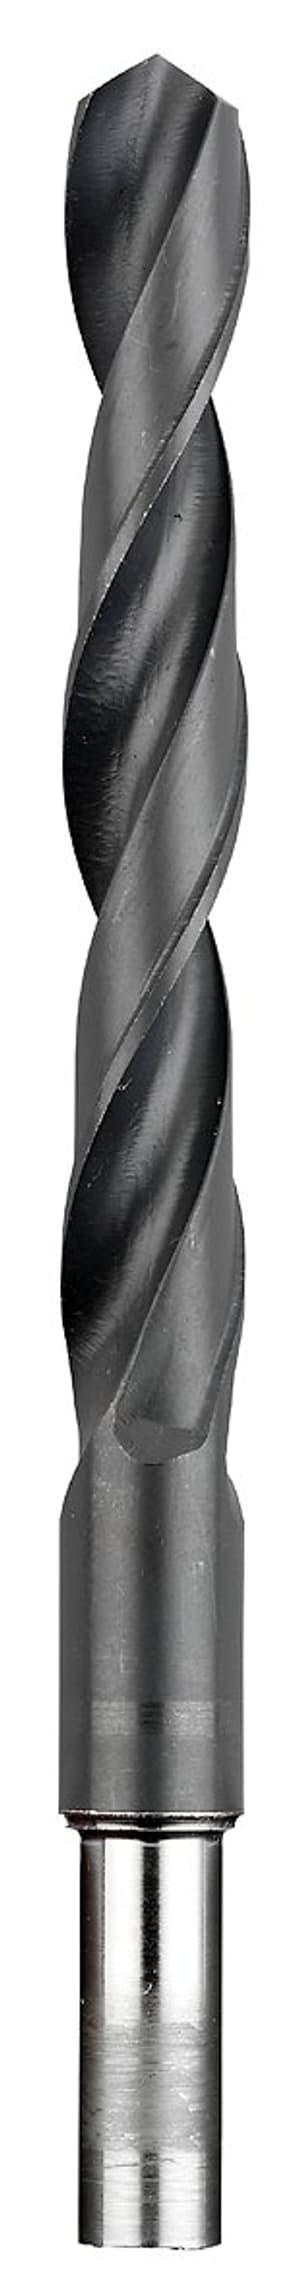 HSS Spiralbohrer mit abgedrehtem Schaft, ø 18.0 mm